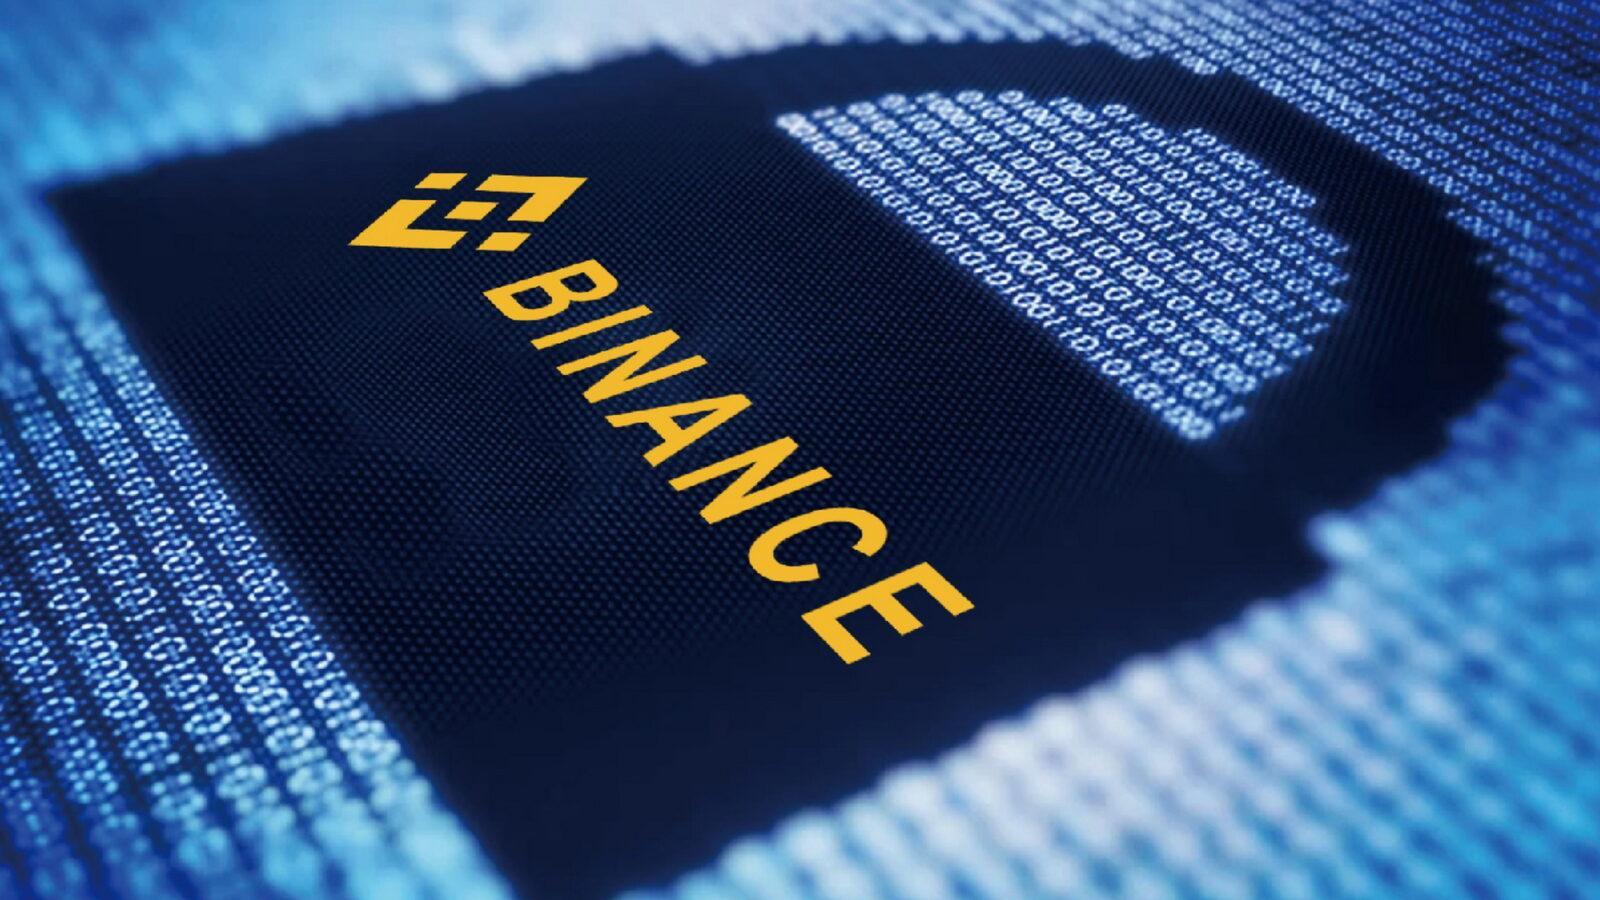 How to Make Money Trading on Binance